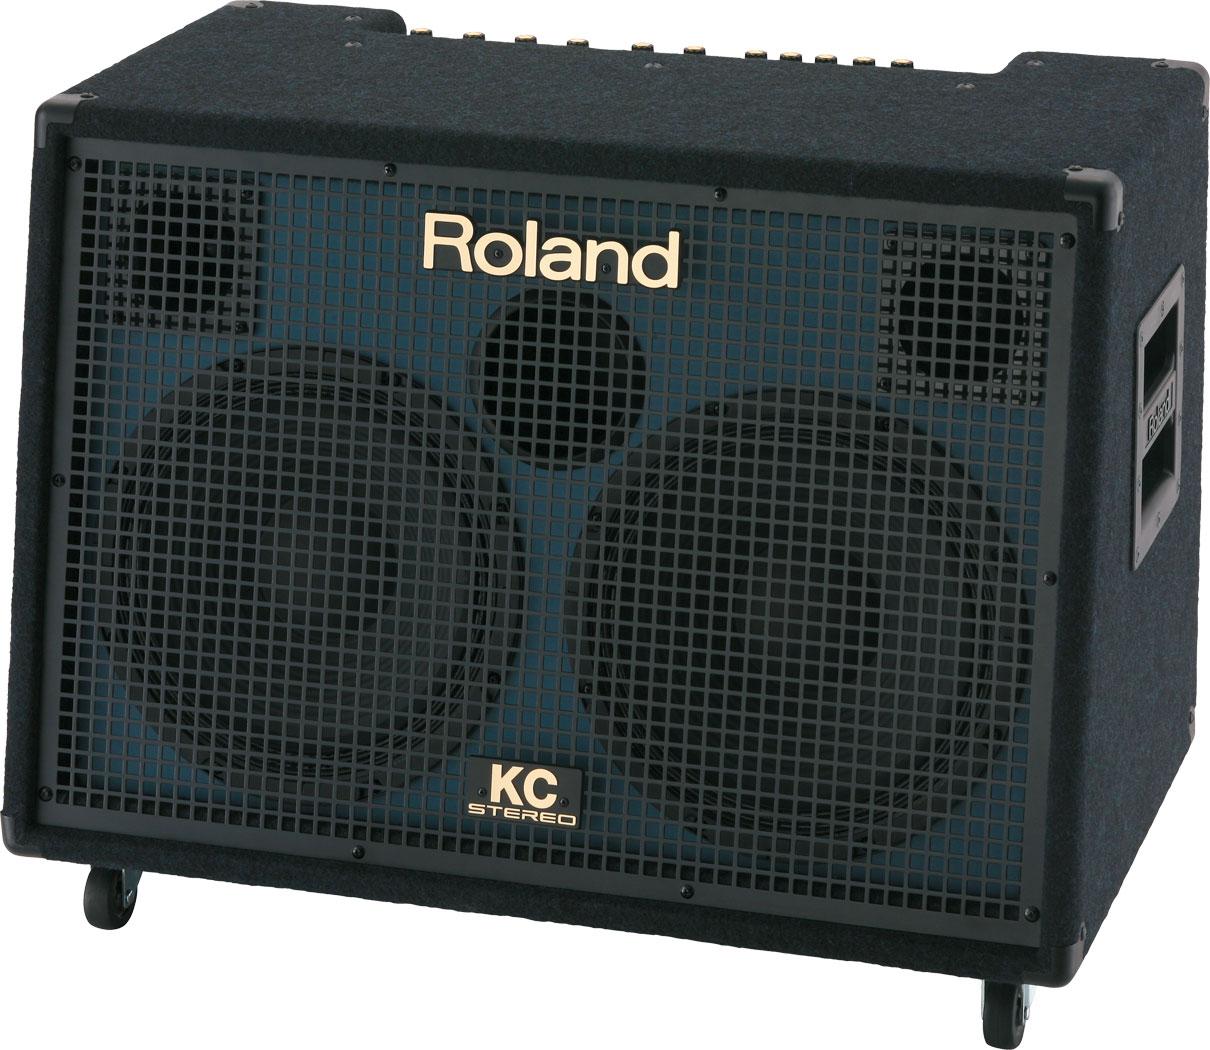 roland kc 880 stereo mixing keyboard amplifier rh roland com Roland KC 880 Review Roland KC 400